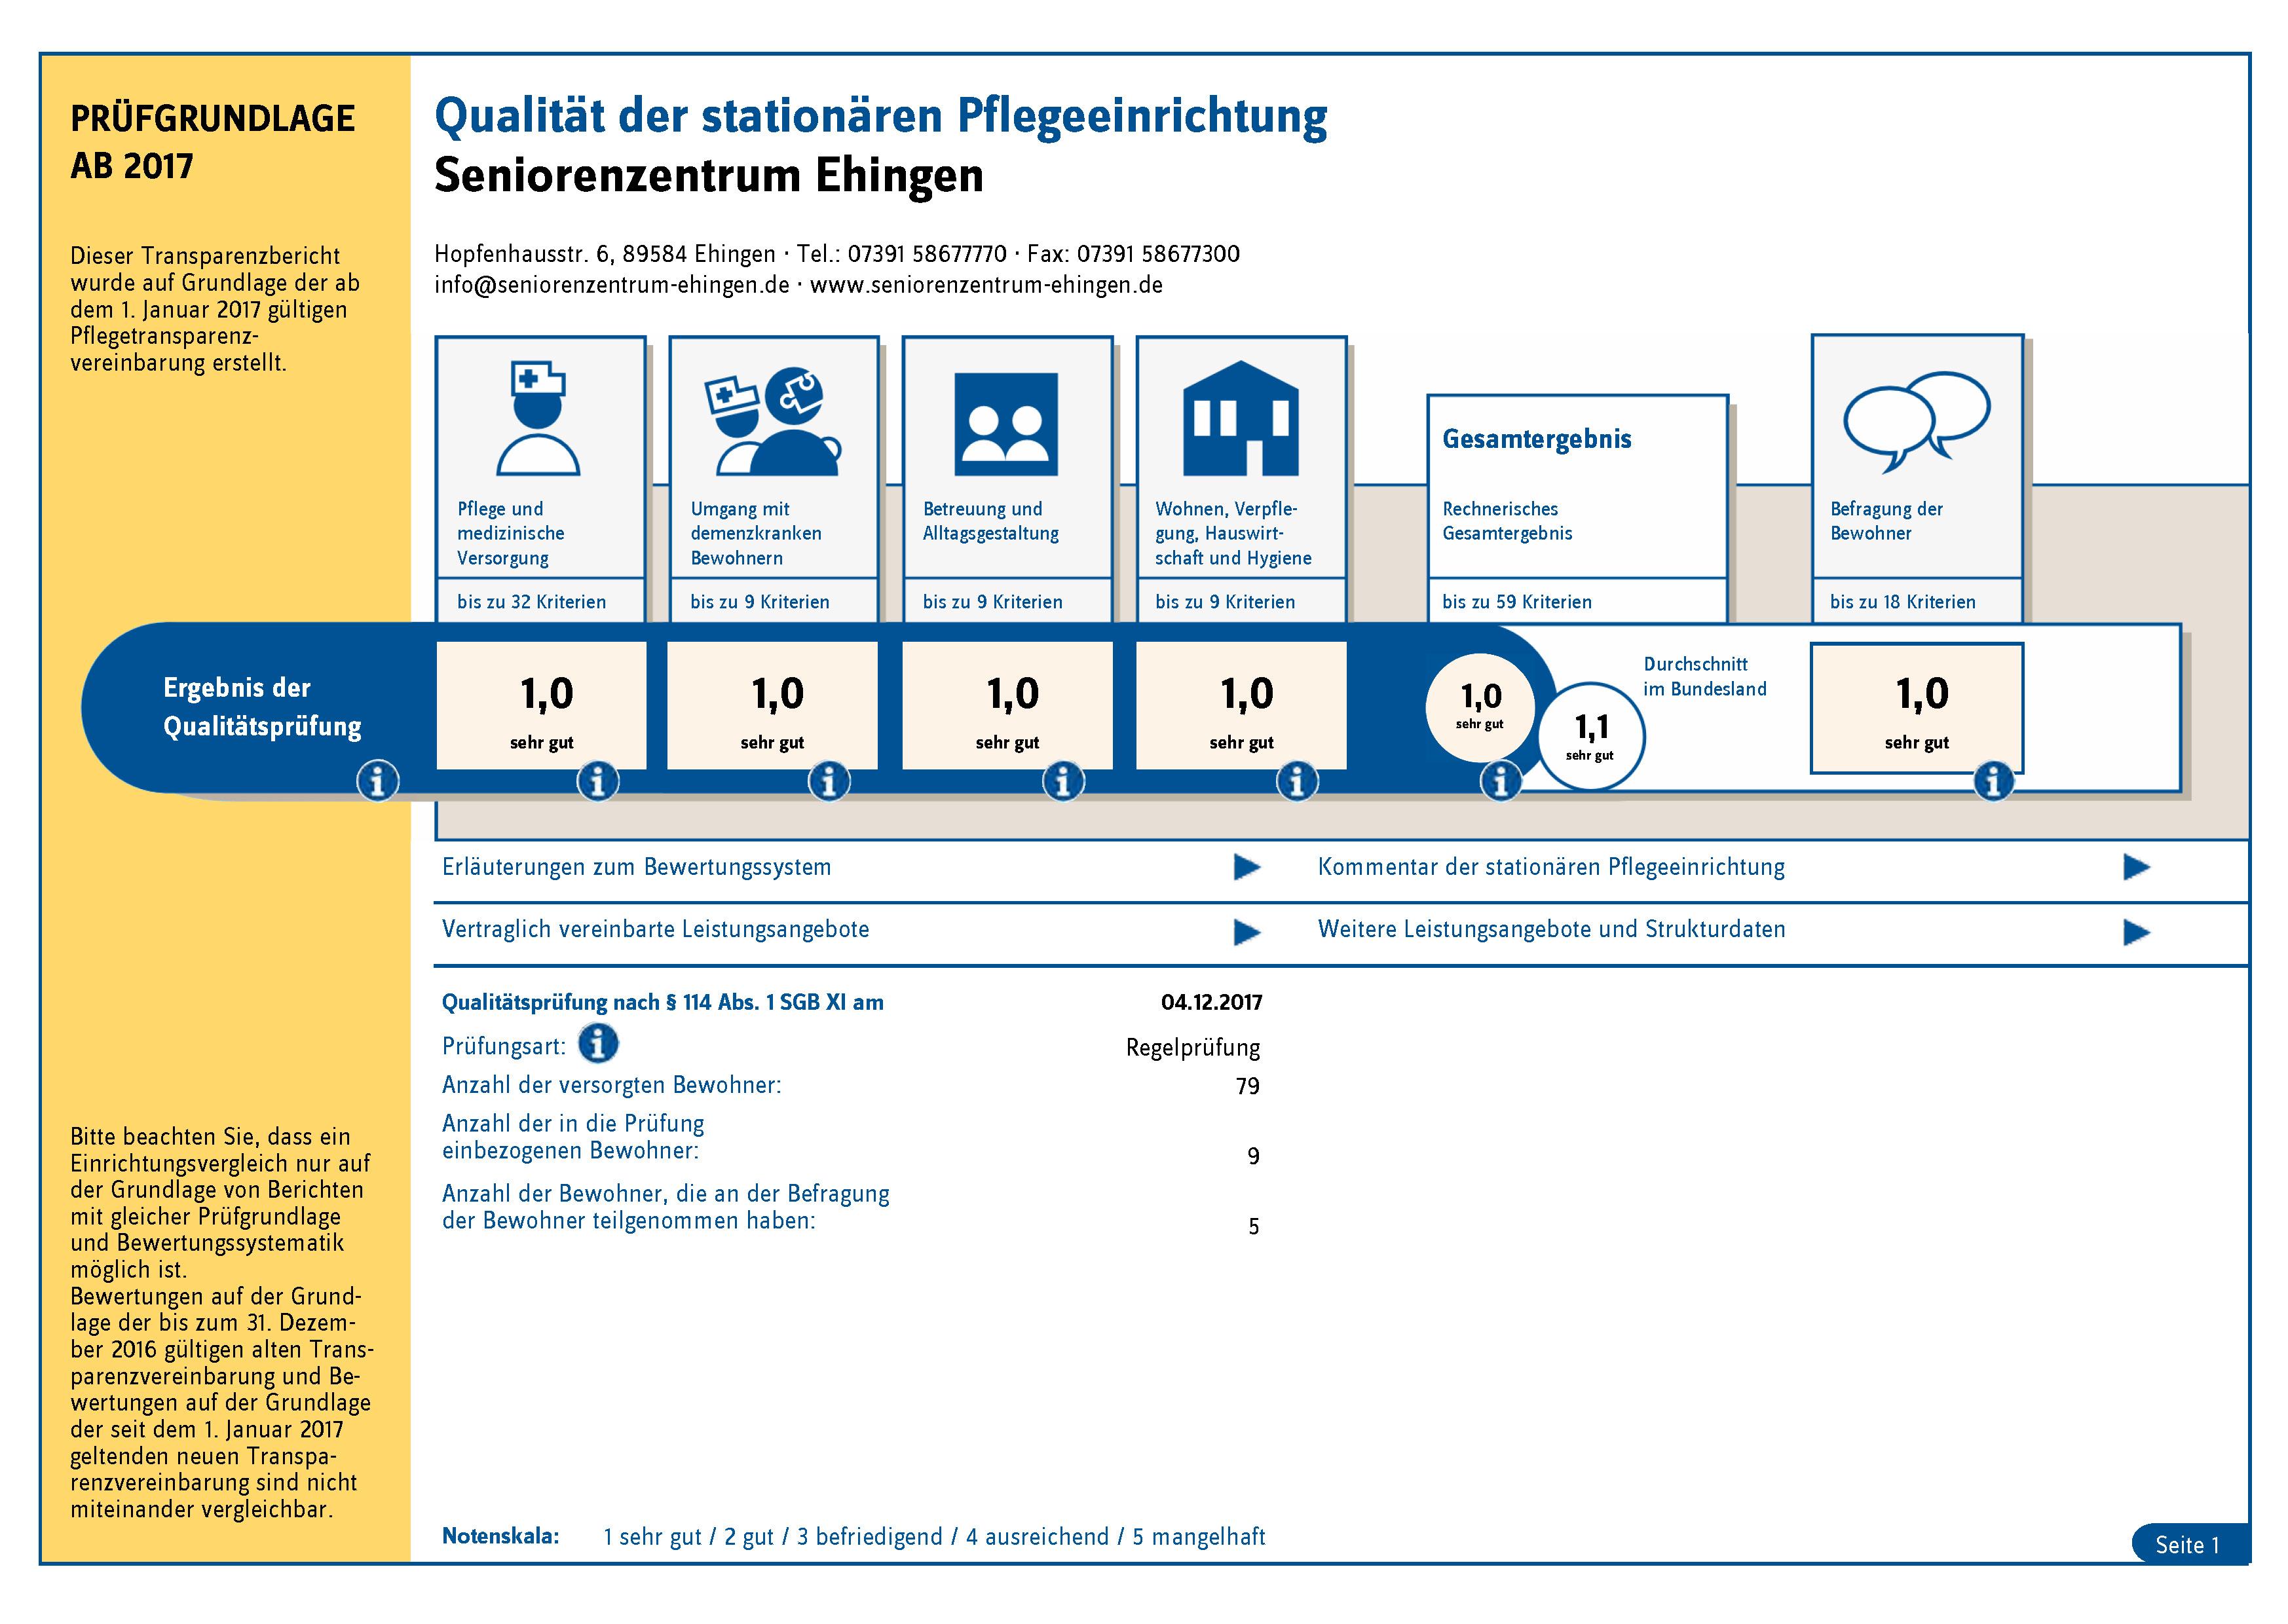 Seniorenzentrum Ehingen, MDK-Transparenzbericht